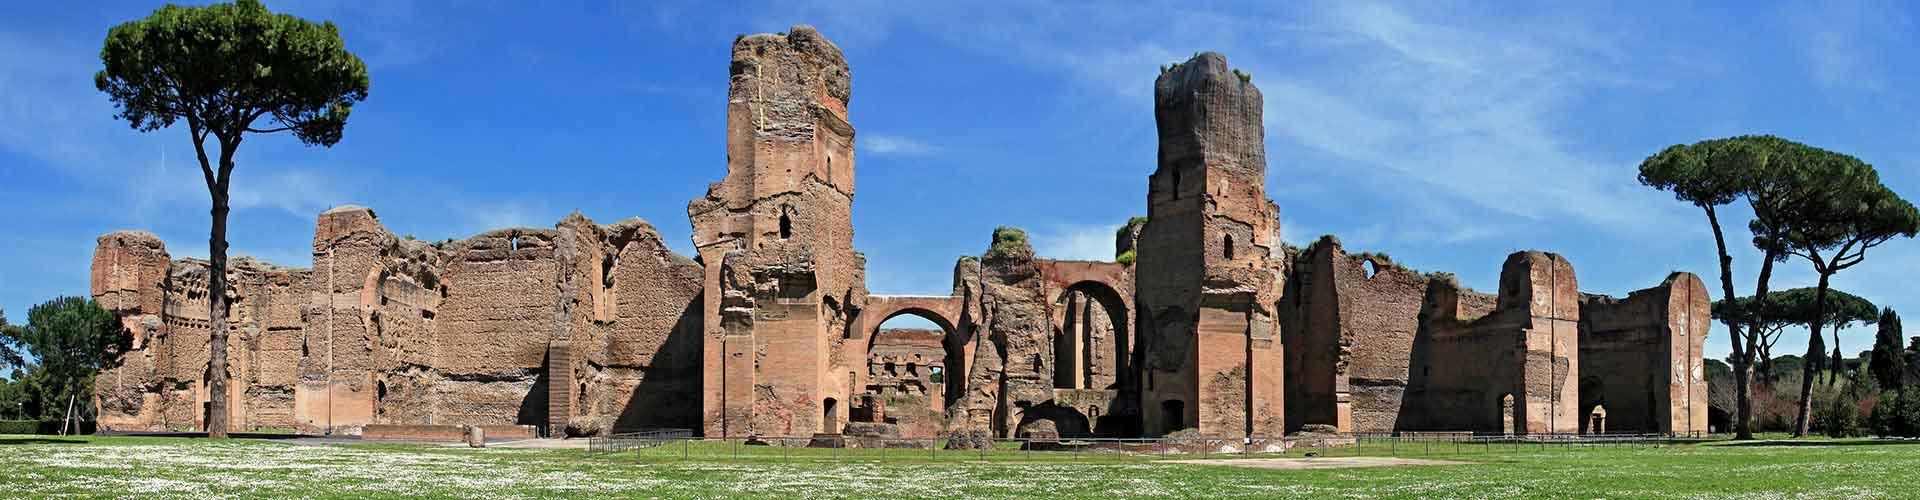 Roma - Hostales cerca a Termas de Caracalla. Mapas de Roma, Fotos y comentarios de cada Hostal en Roma.